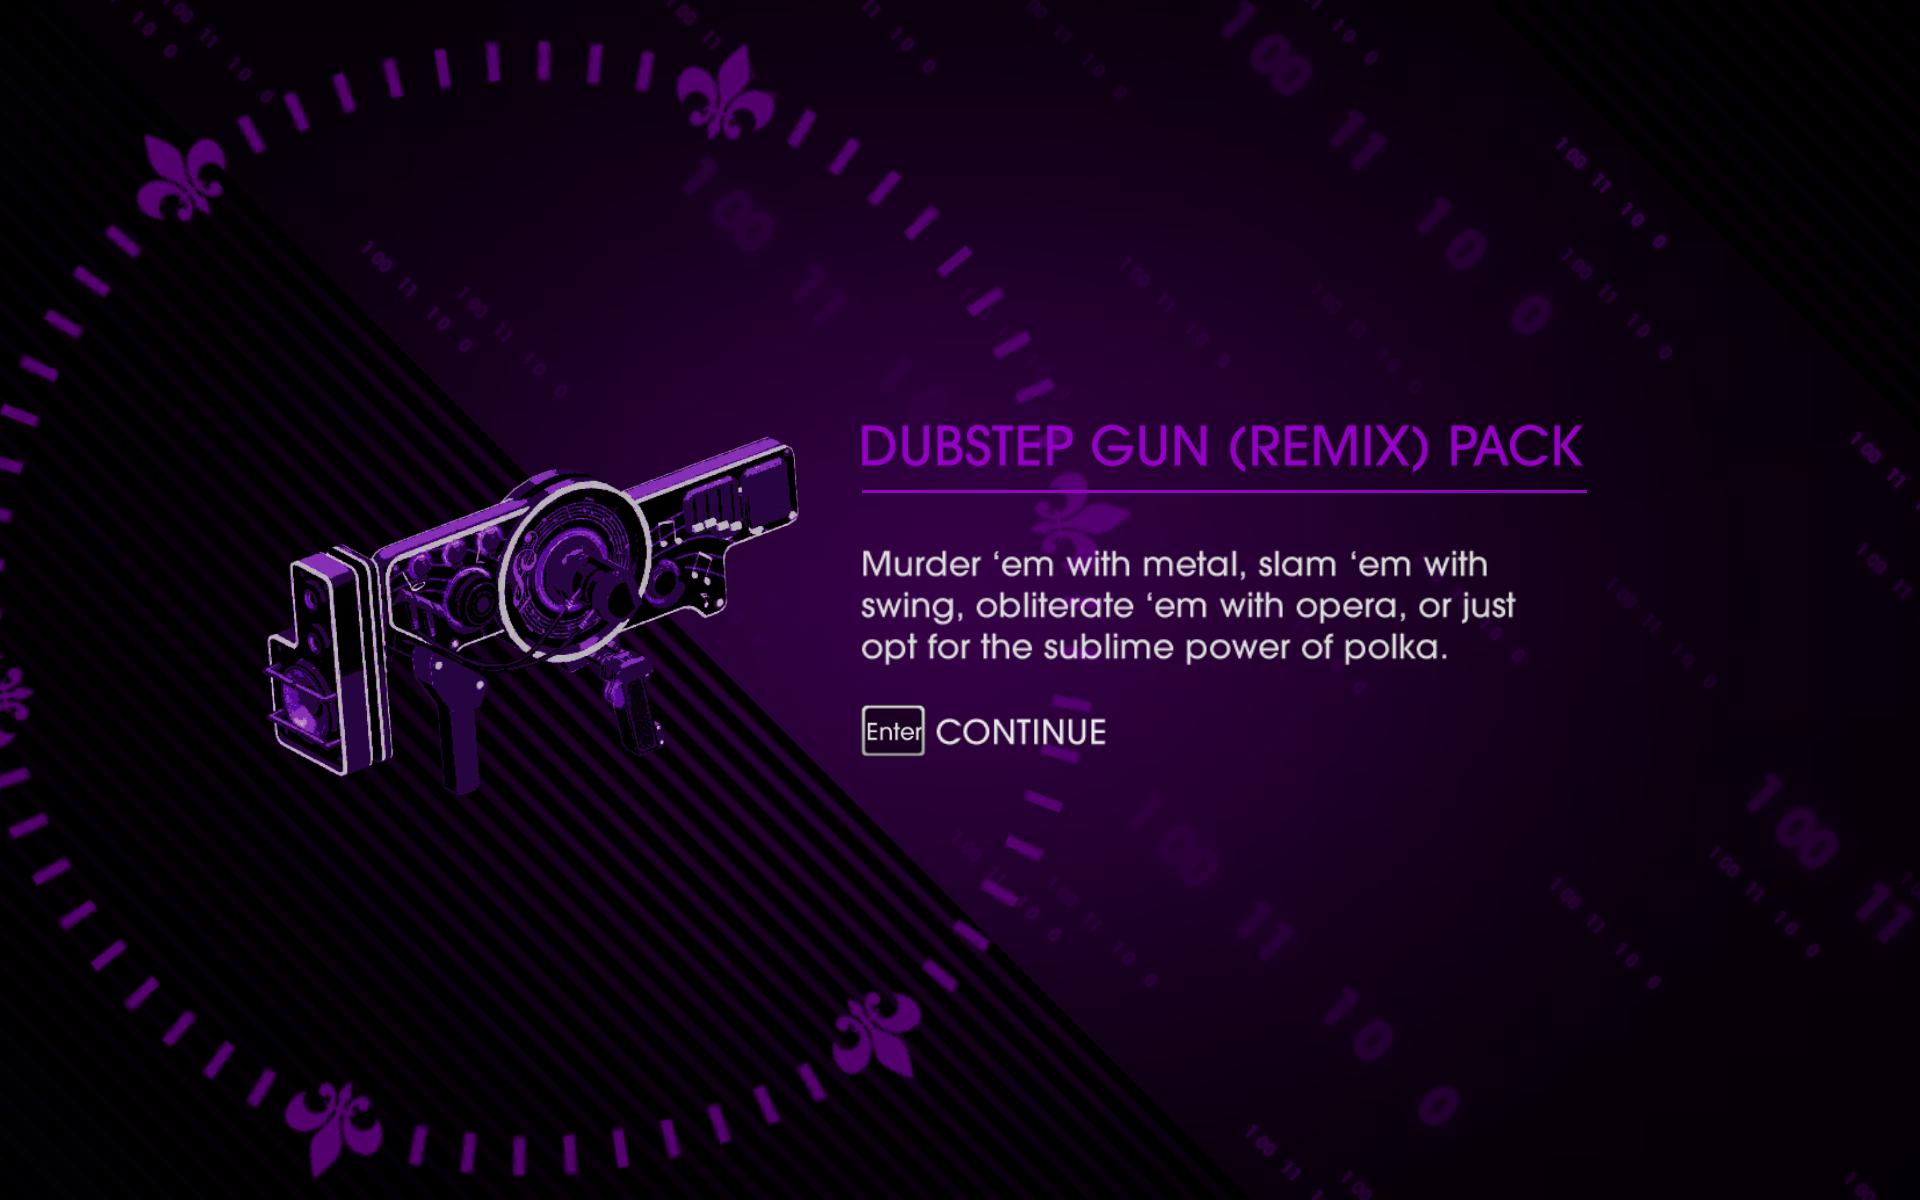 Image - Saints Row IV - Dubstep Gun (Remix) Pack unlock ...